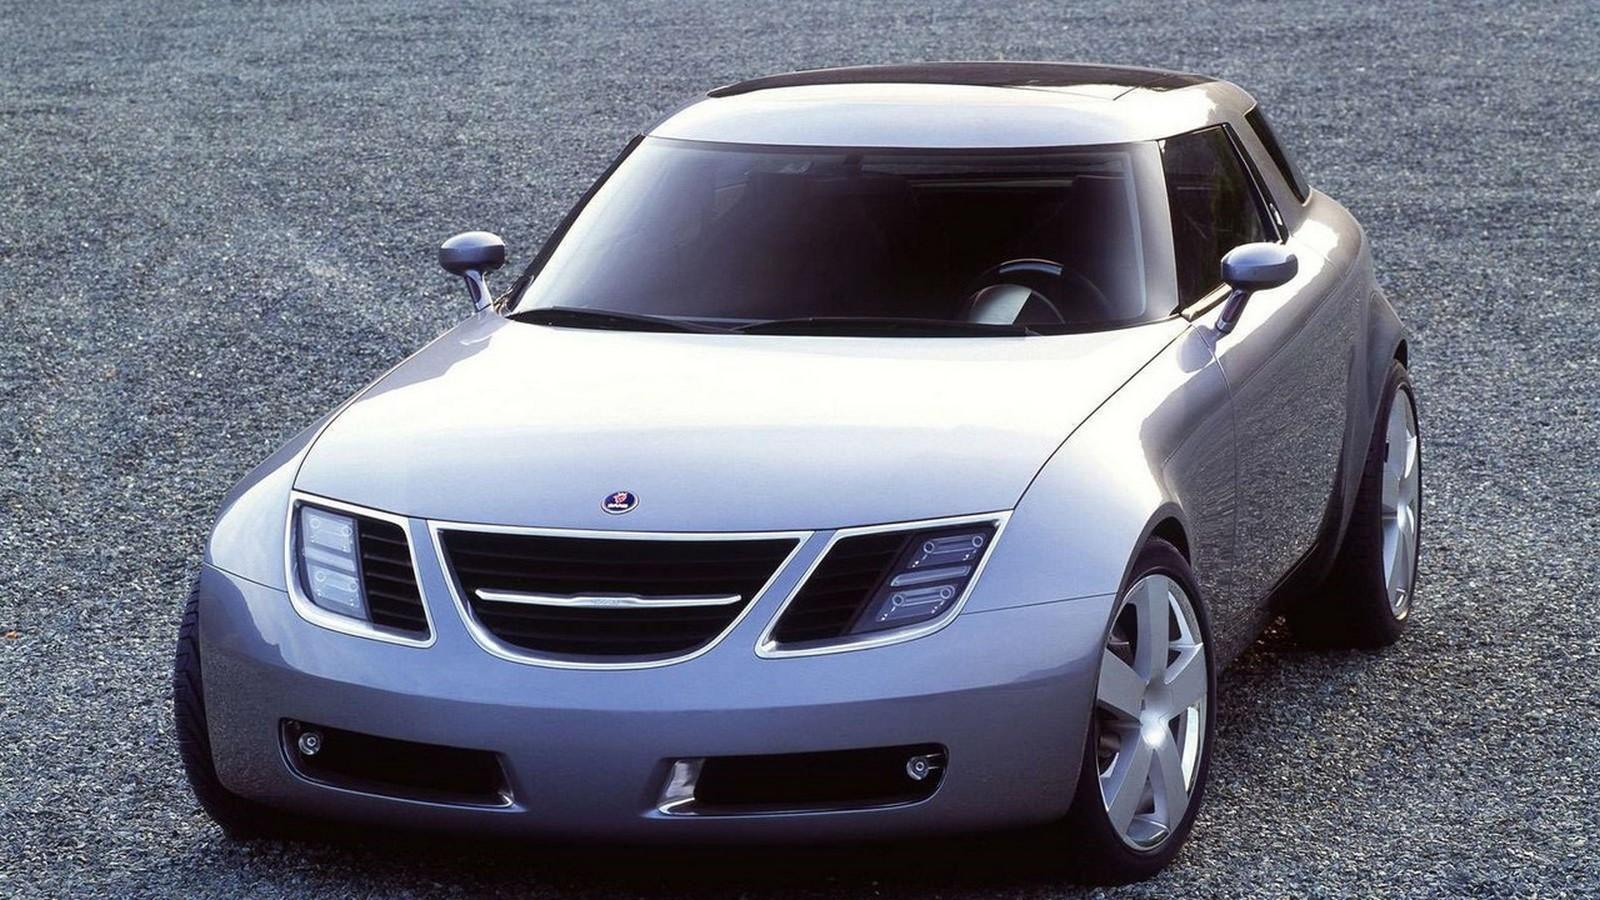 2001-saab-9x-concept (5)